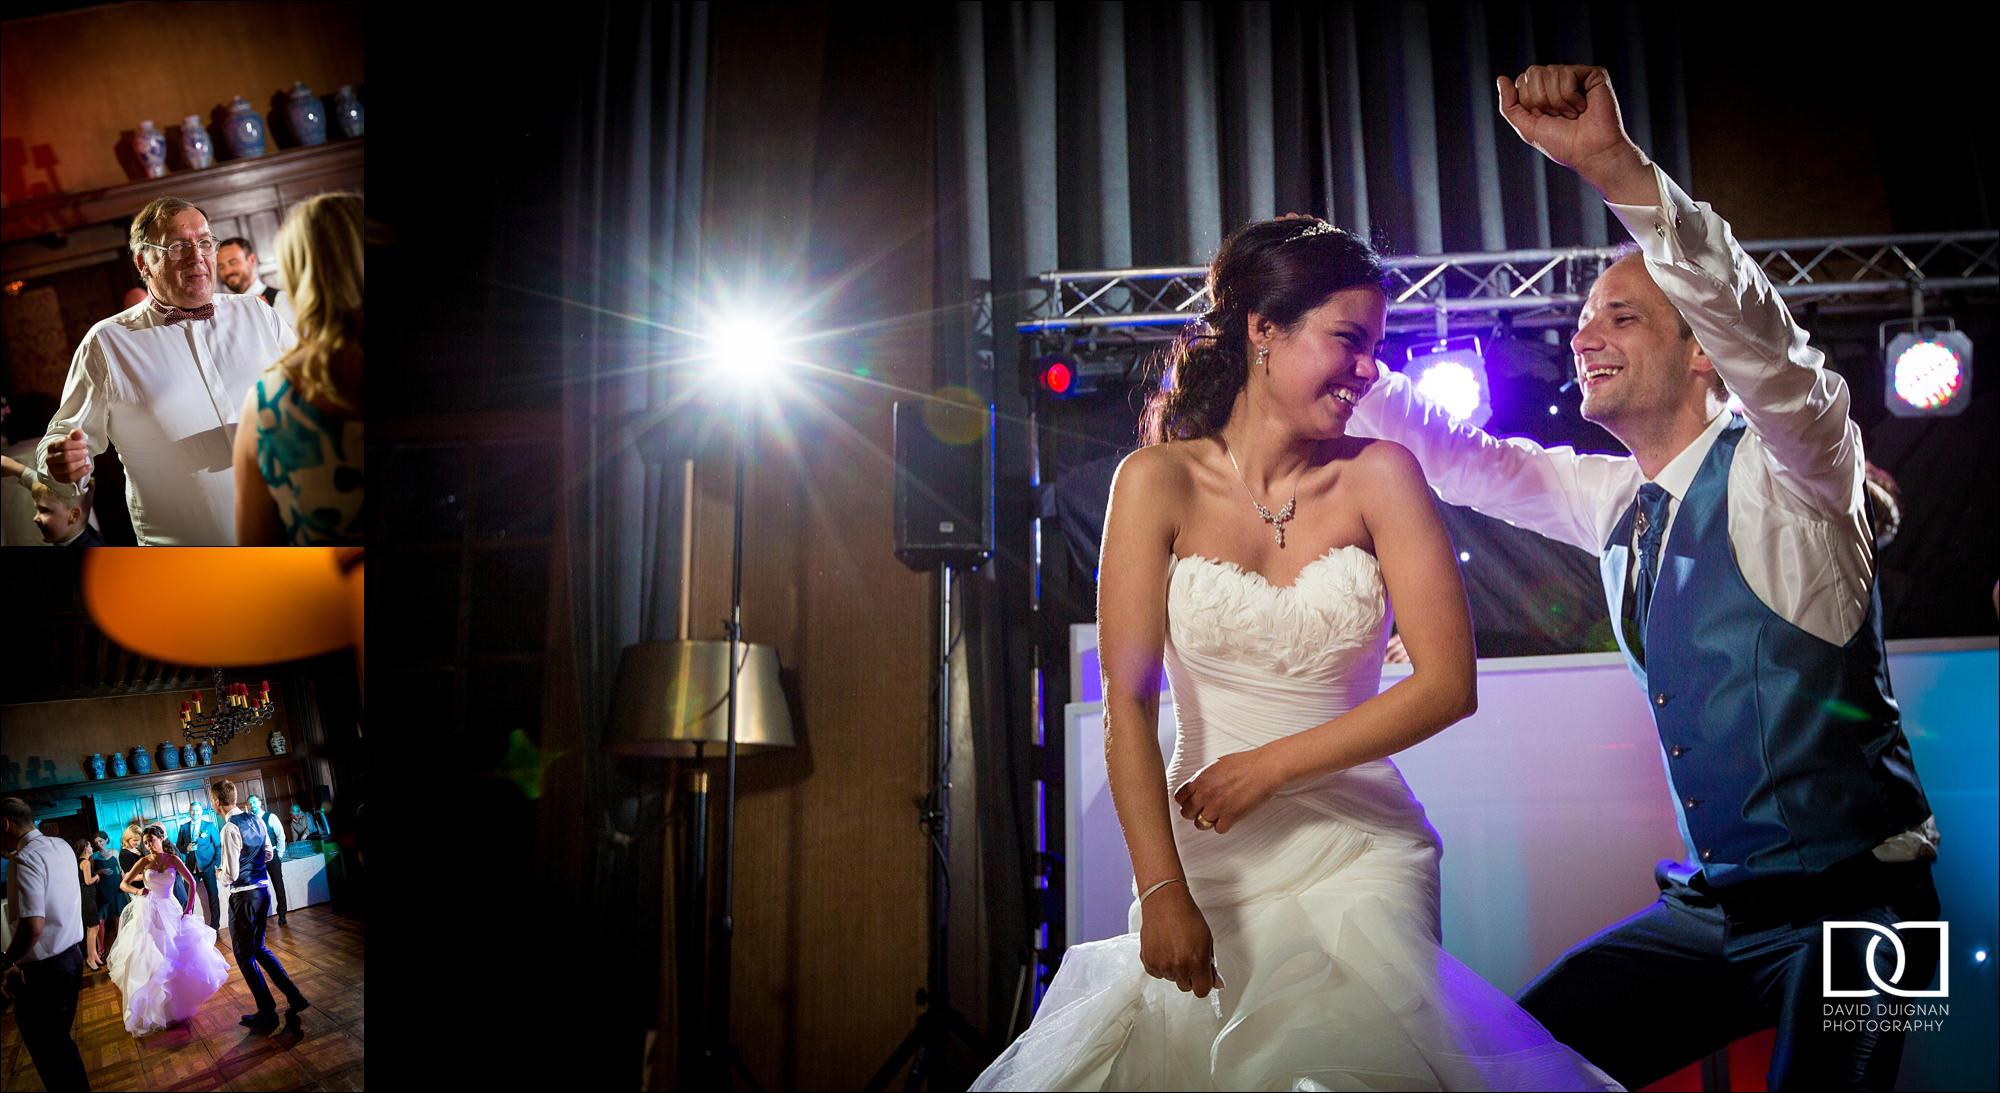 dublin wedding photographer david duignan photography wedding photos 0060